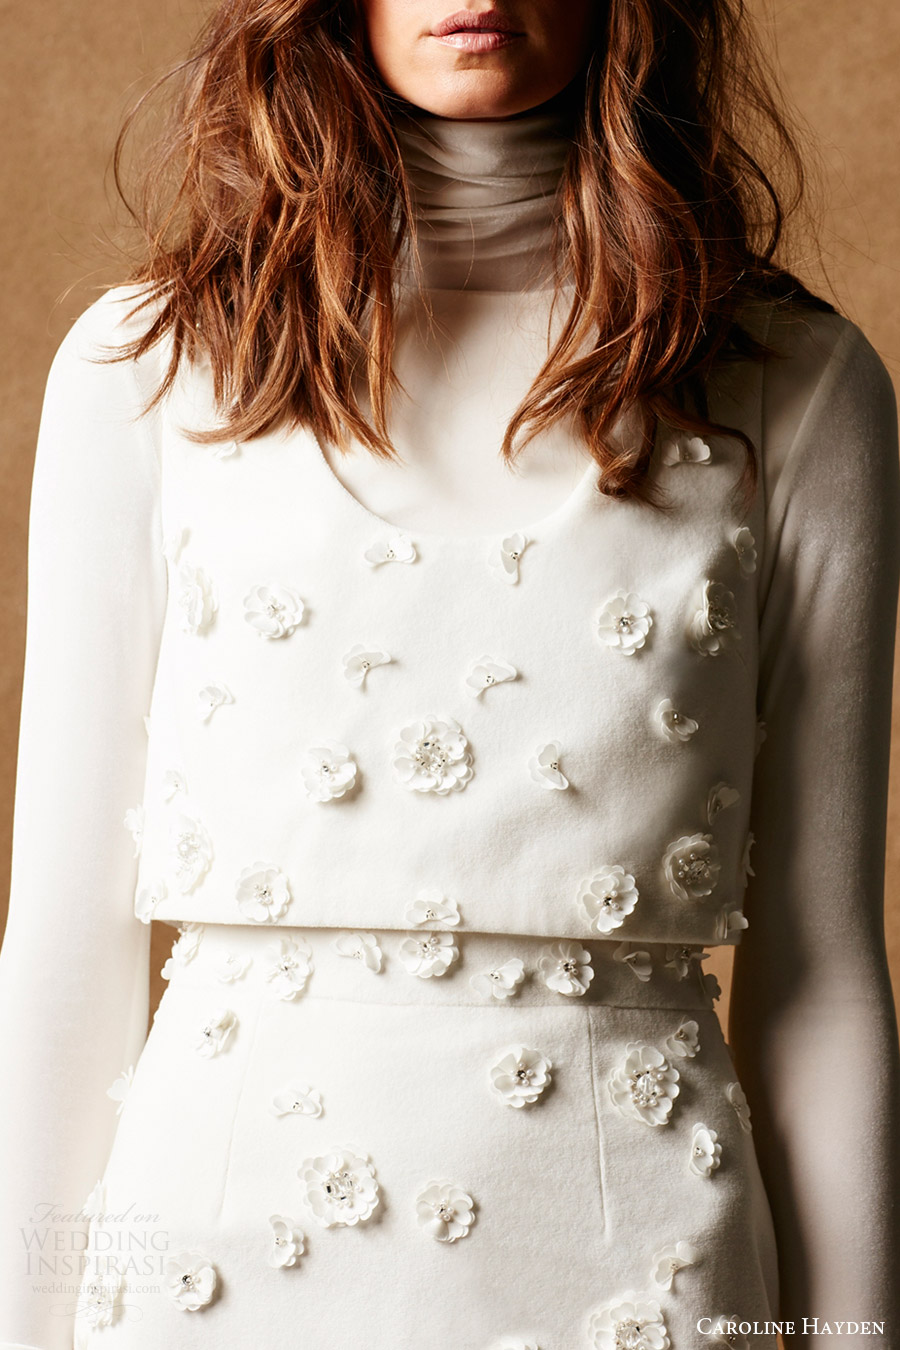 caroline hayden bridal 2017 long sleeve turtleneck skirt vest (ch022 ch023 ch024 ivory) zv